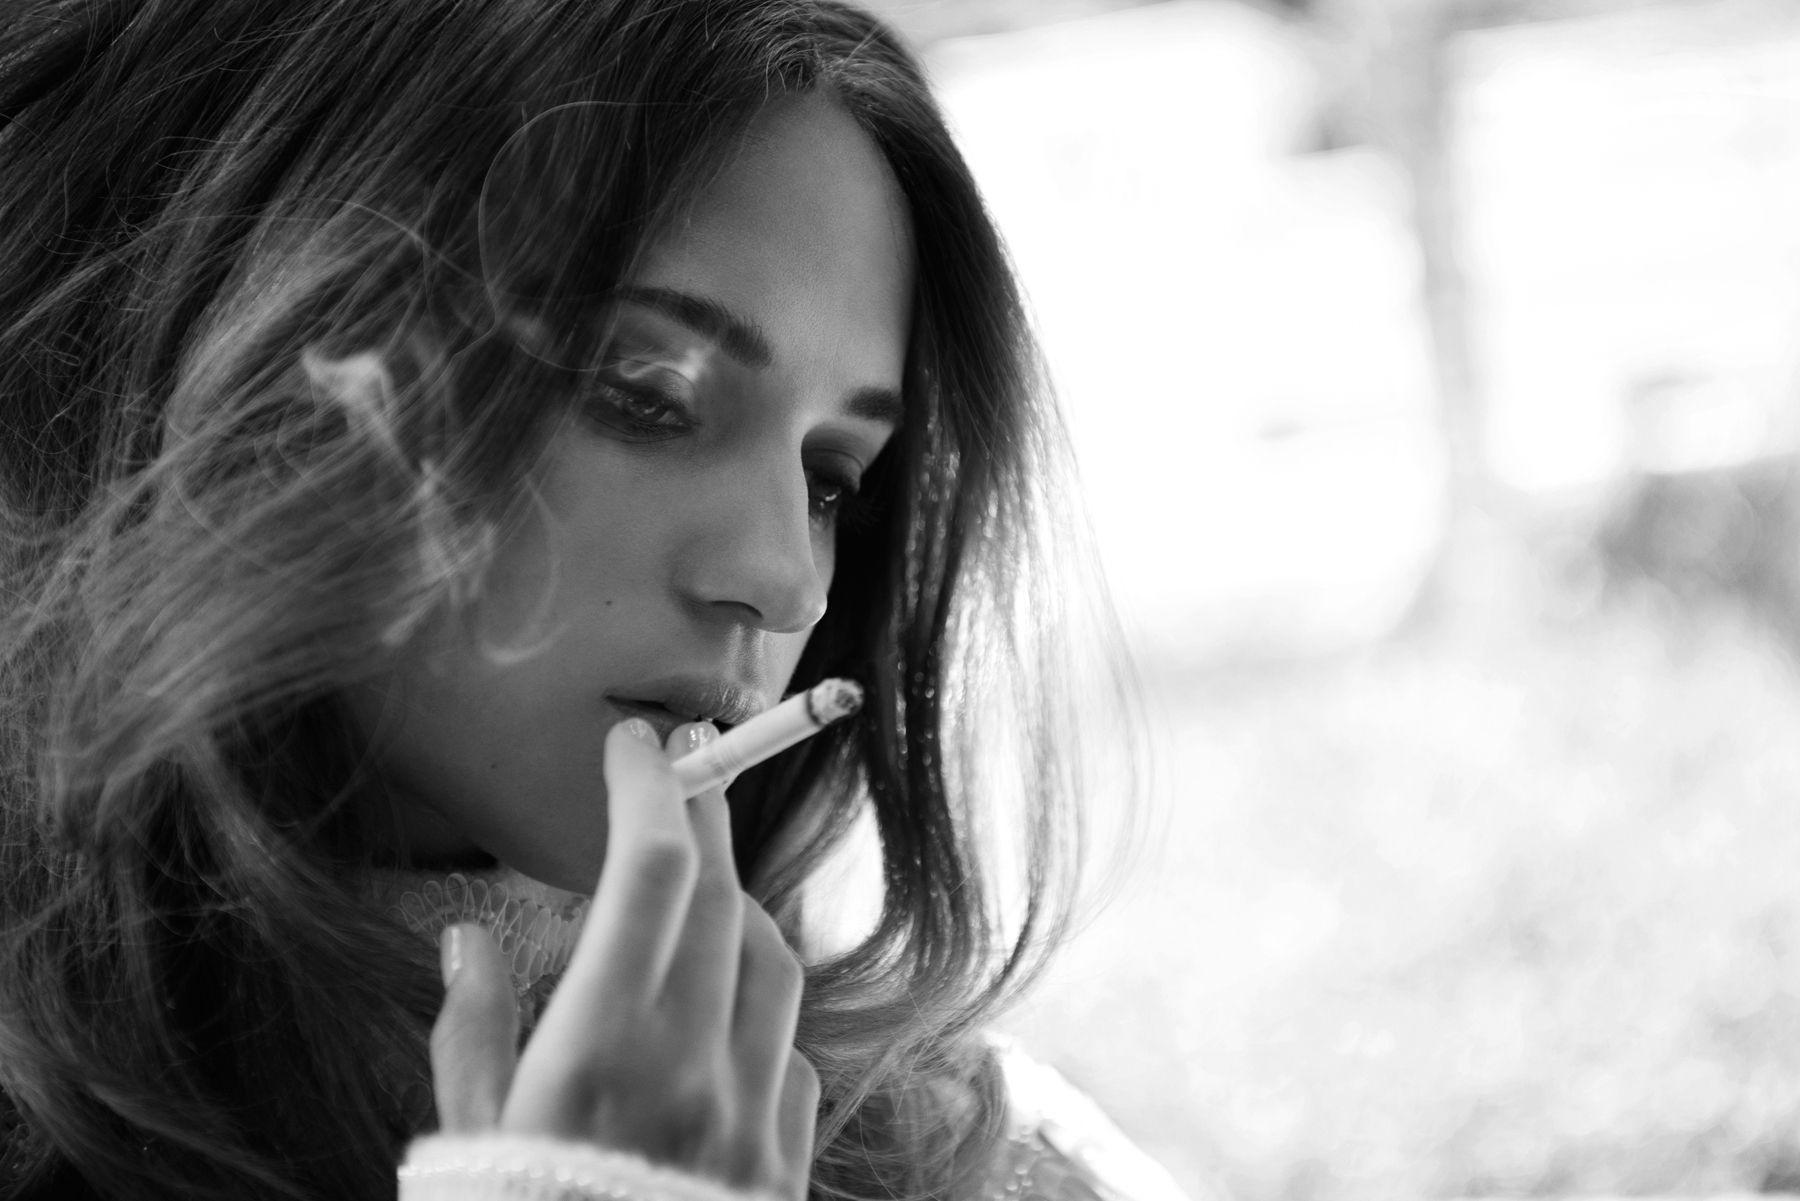 Самые заядлые курильщики среди зарубежных звёзд